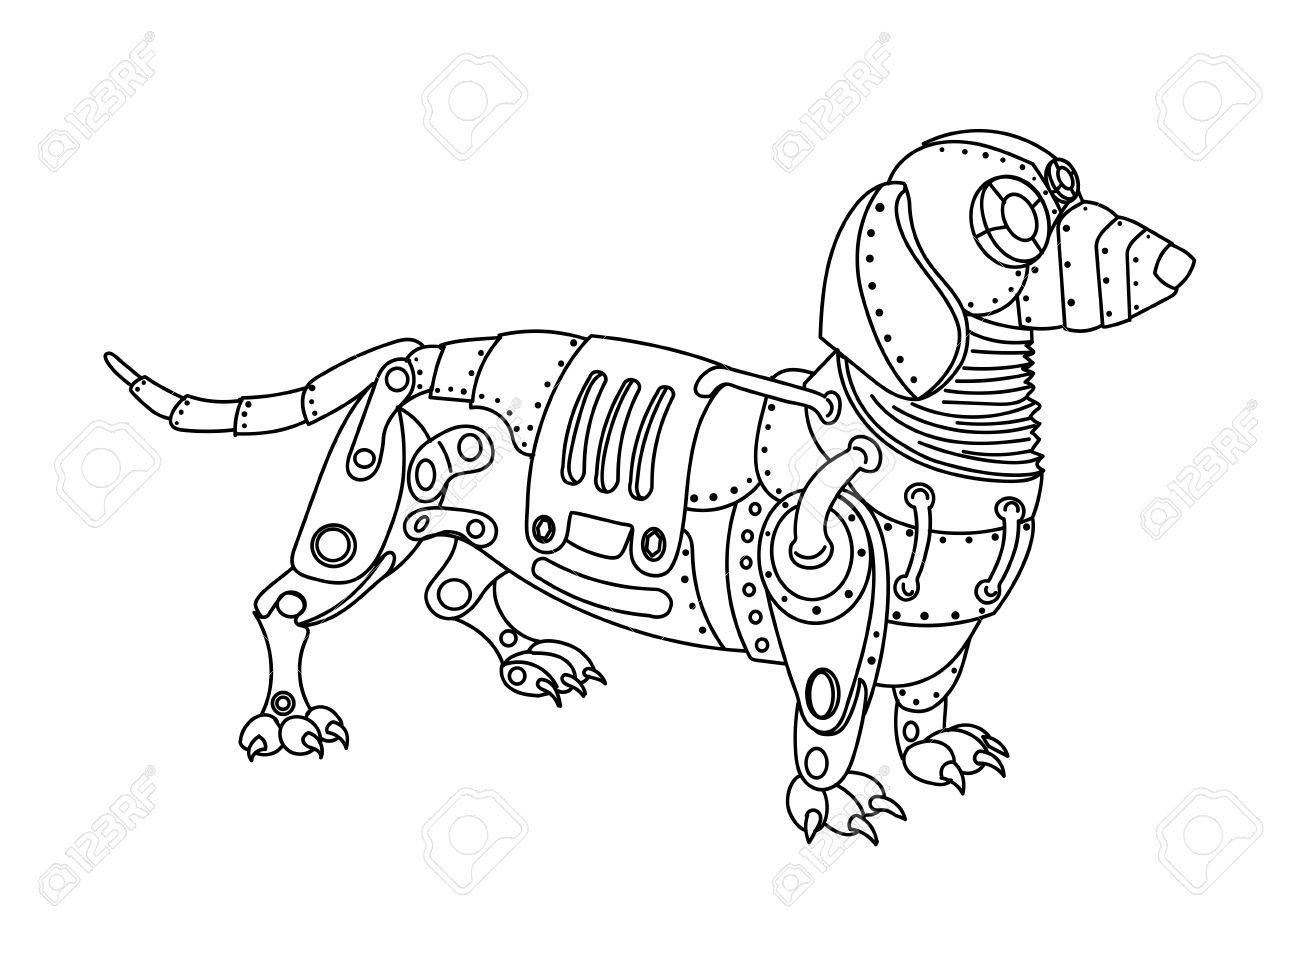 Steampunk chien teckel style animaux m caniques livre de - Dessin teckel ...